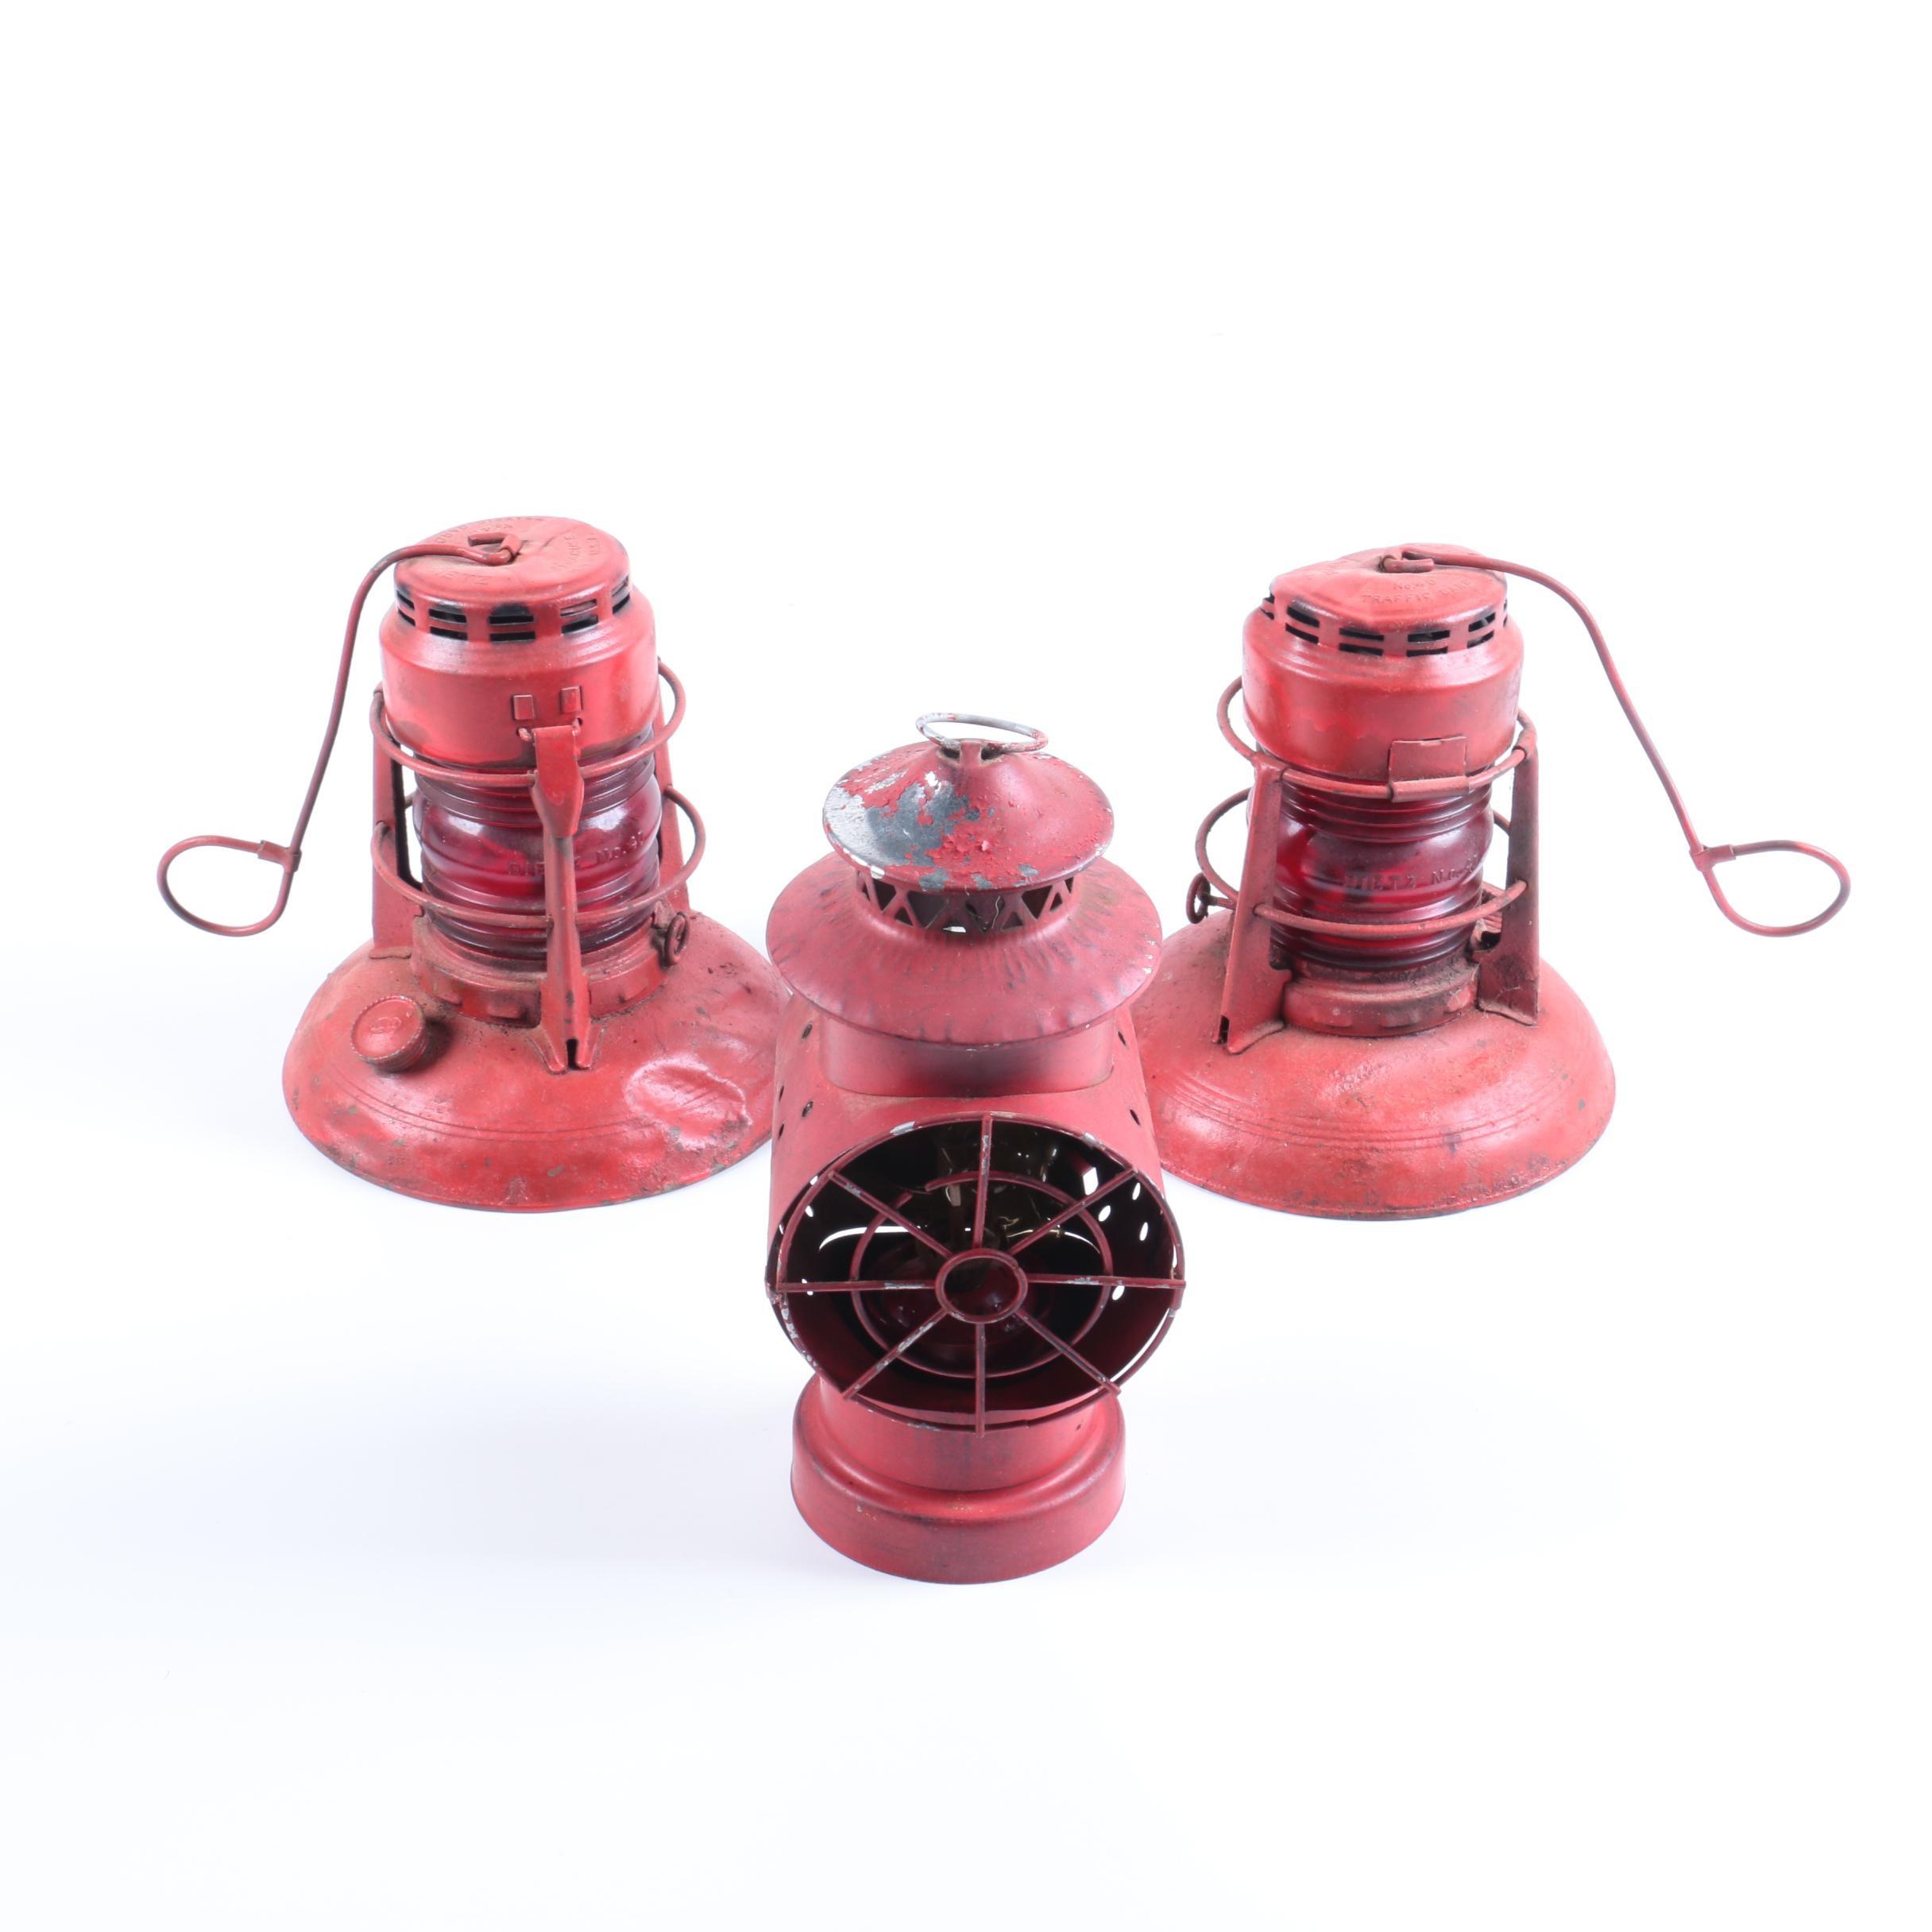 Dietz Railroad Lanterns and Signal Lantern